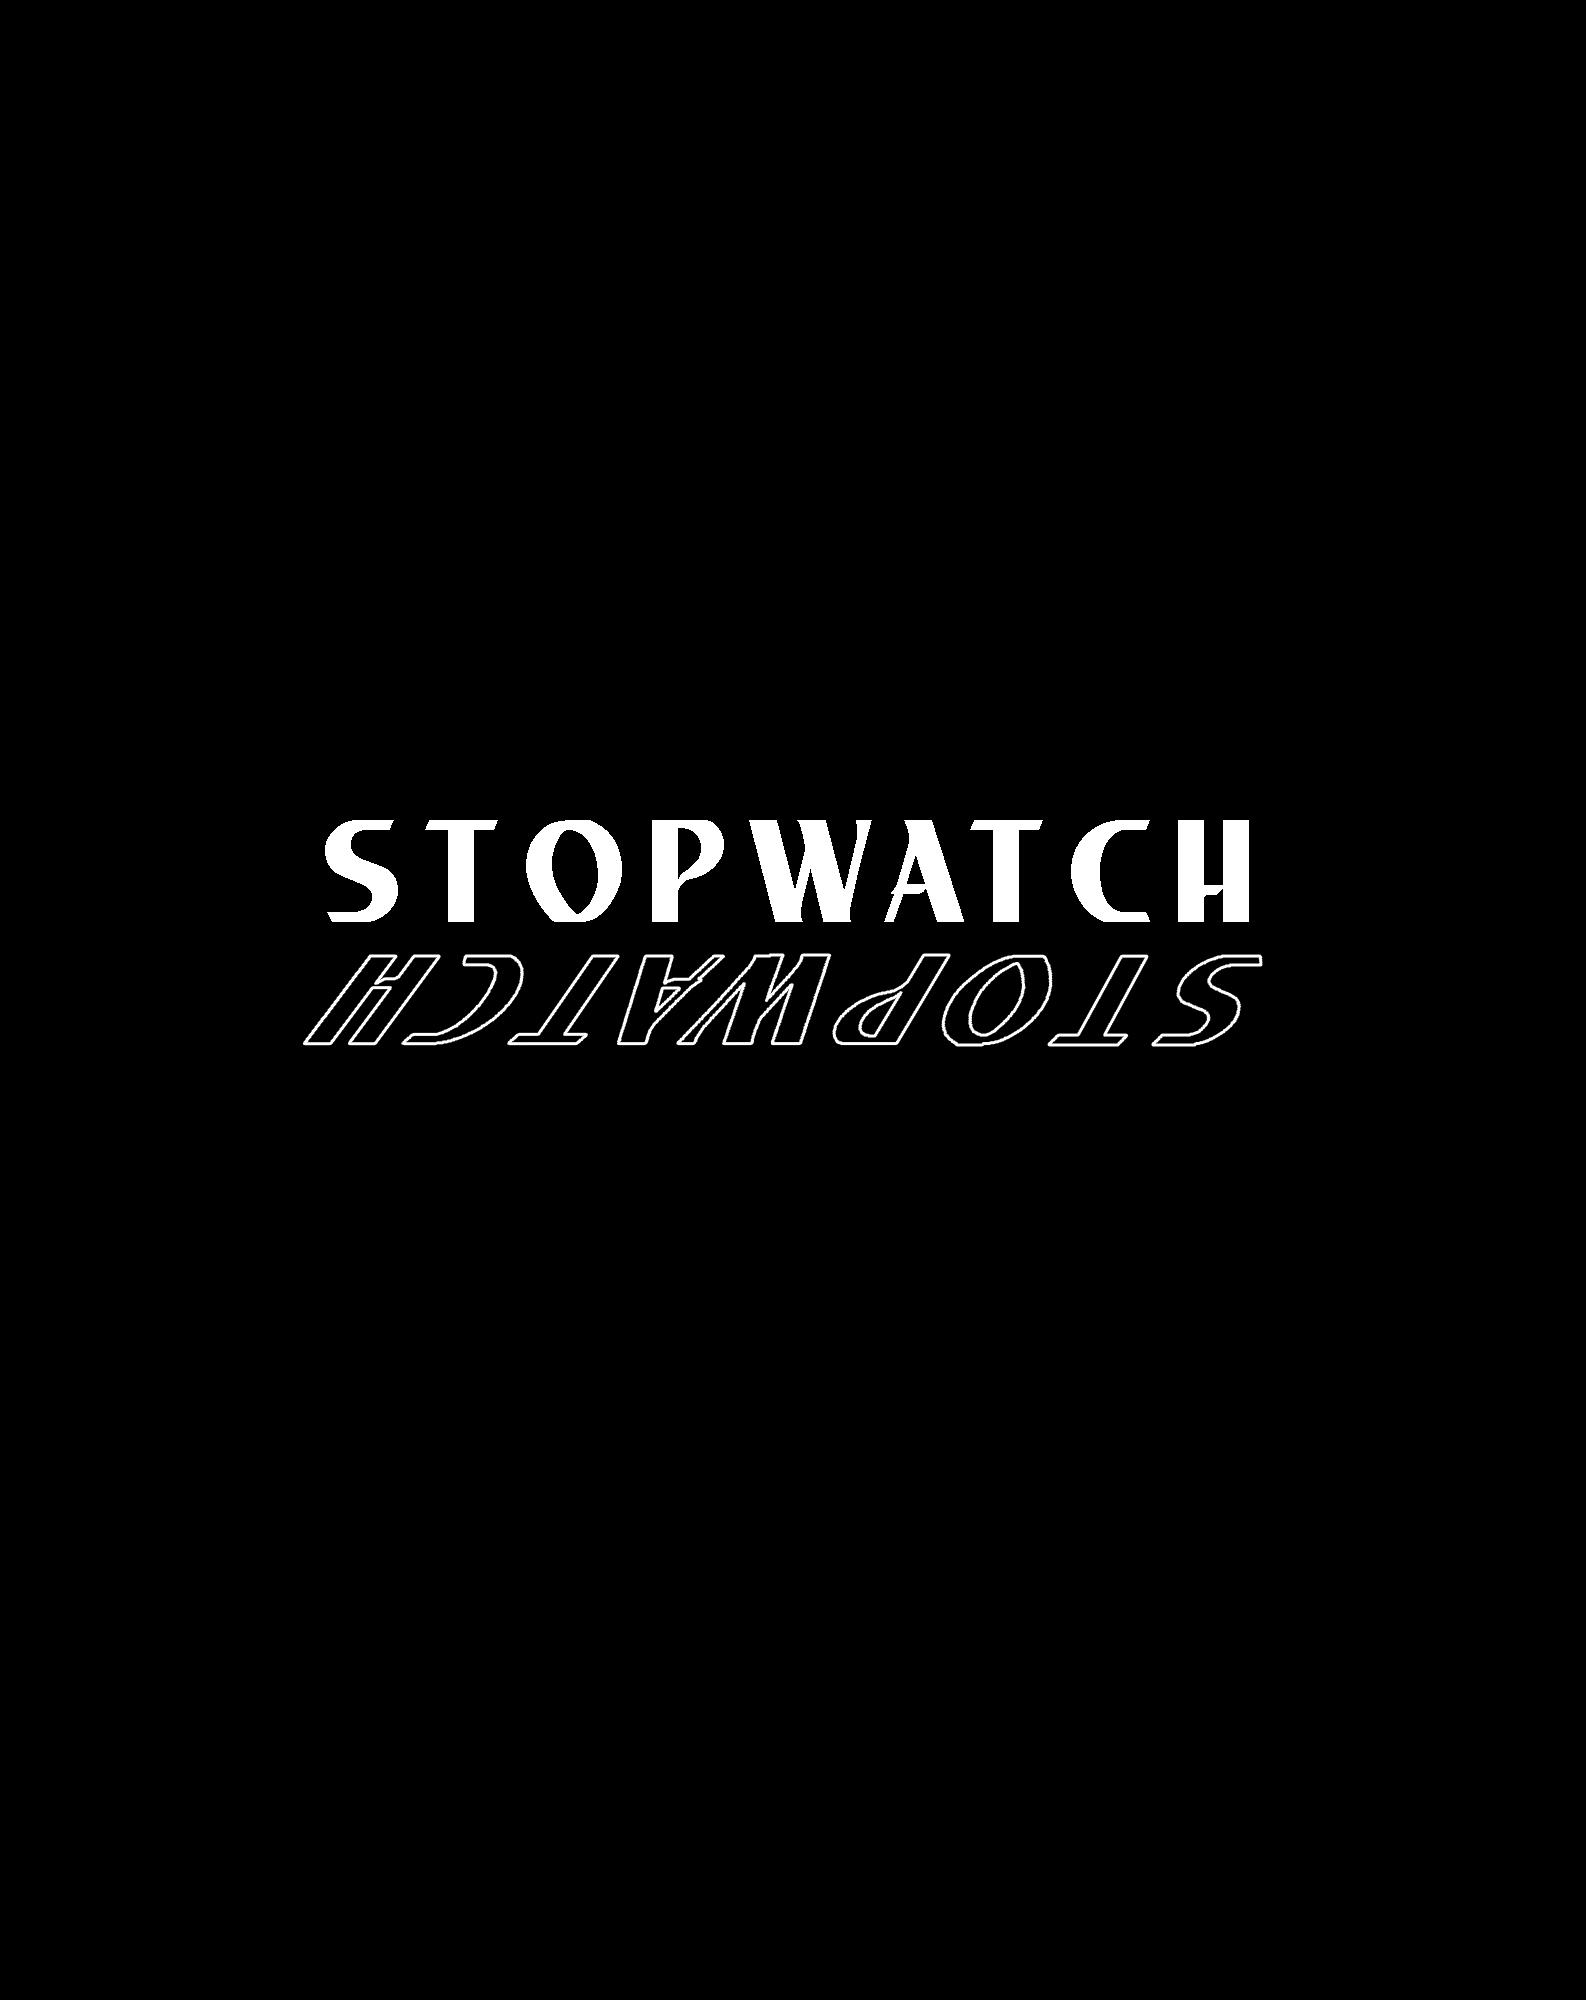 STOPWATCH_GRAPHIC.jpg